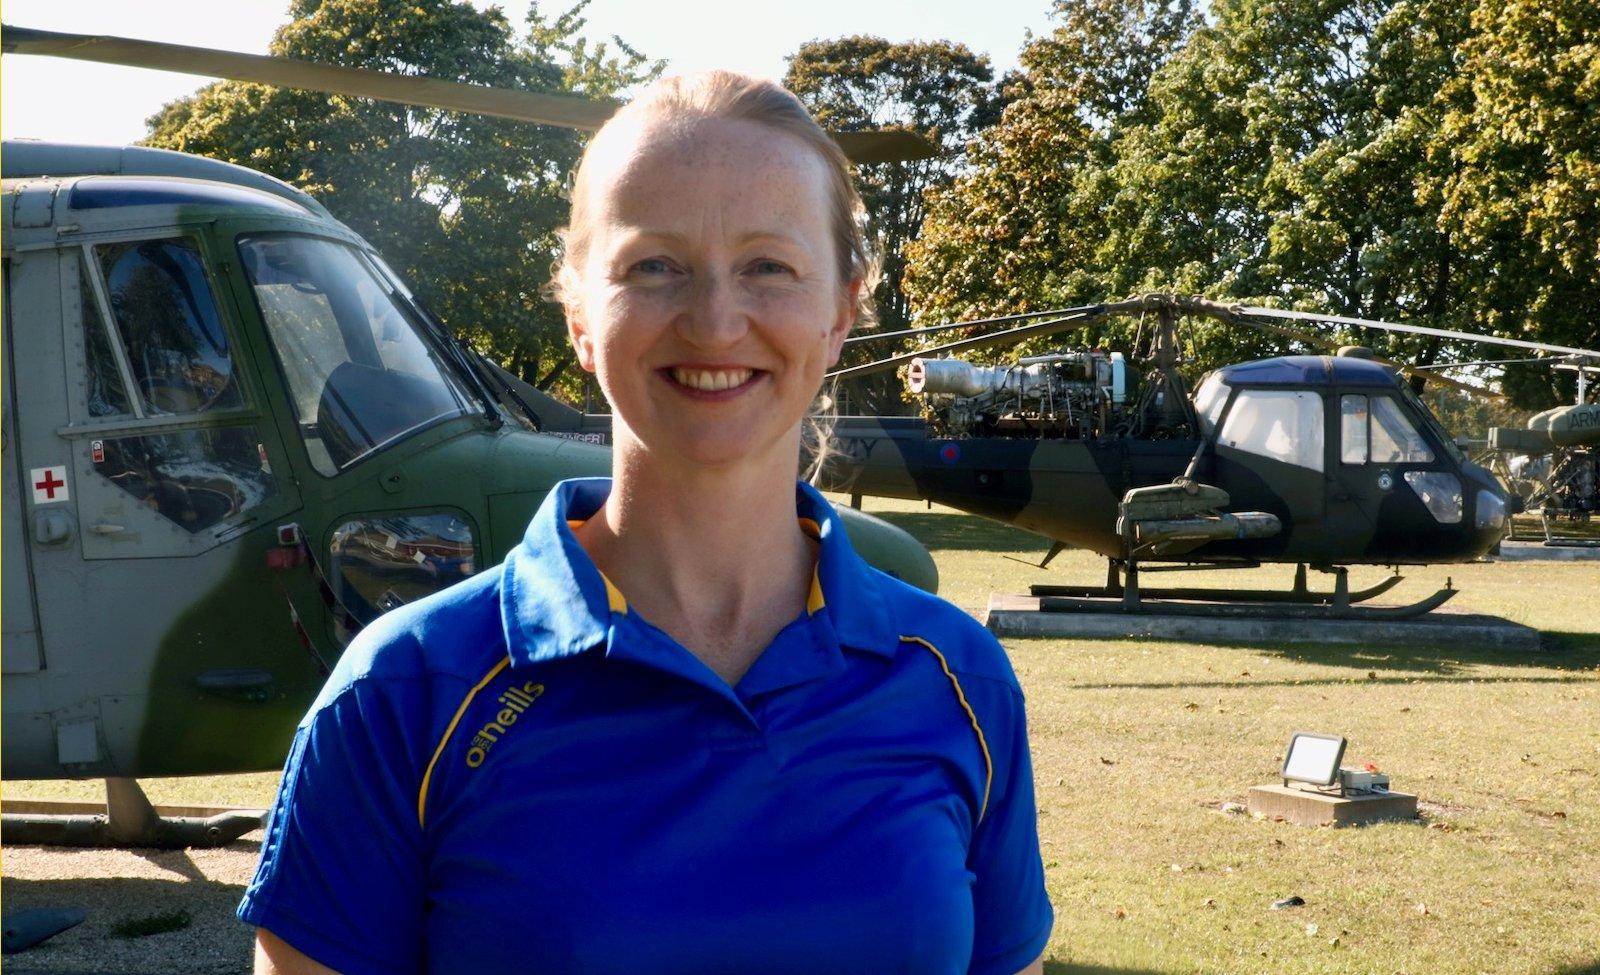 Team Bath's new head coach Jo Vann compares her netball role to her life as an army captain